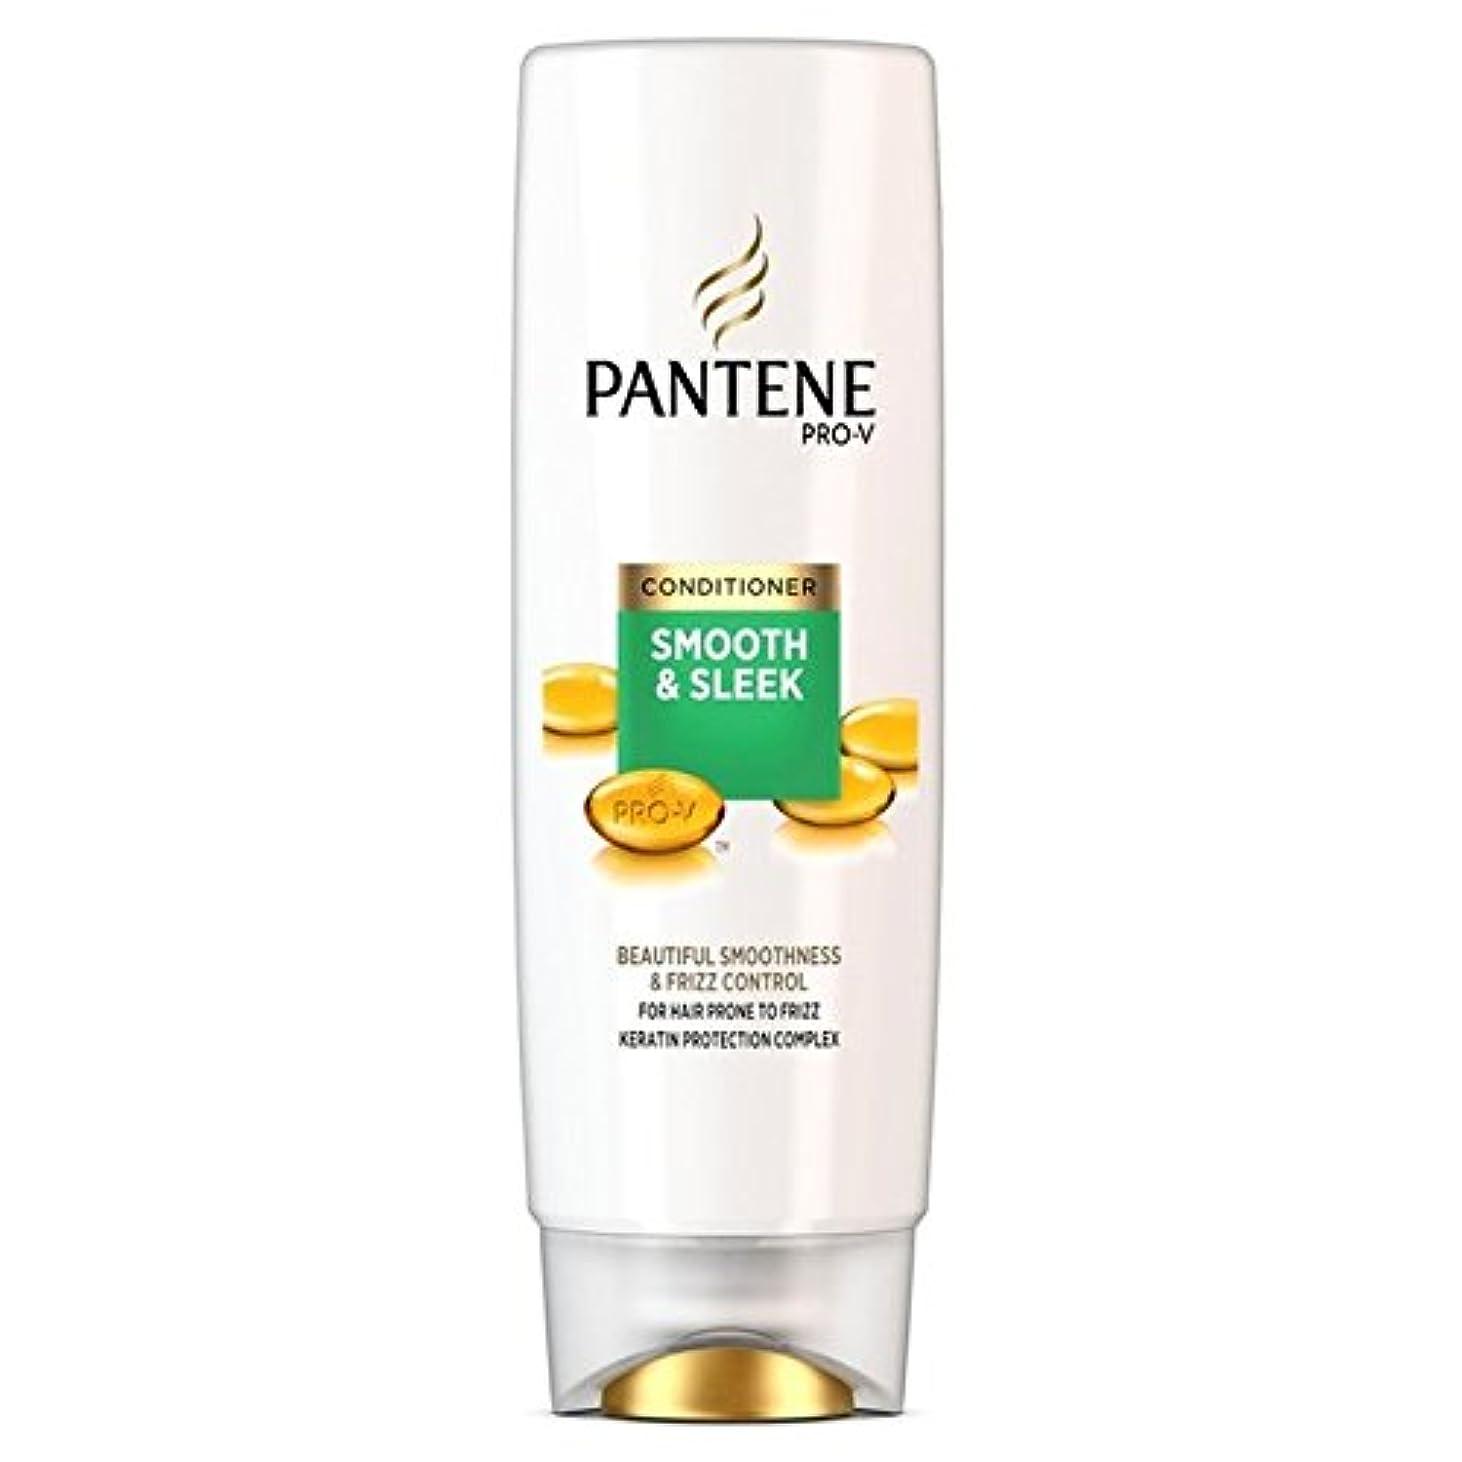 Pantene Conditioner Smooth & Sleek For Hair Prone to Frizz 250ml - パンテーンコンディショナースムーズ&縮れ250ミリリットルを受けやすい髪になめらかな...